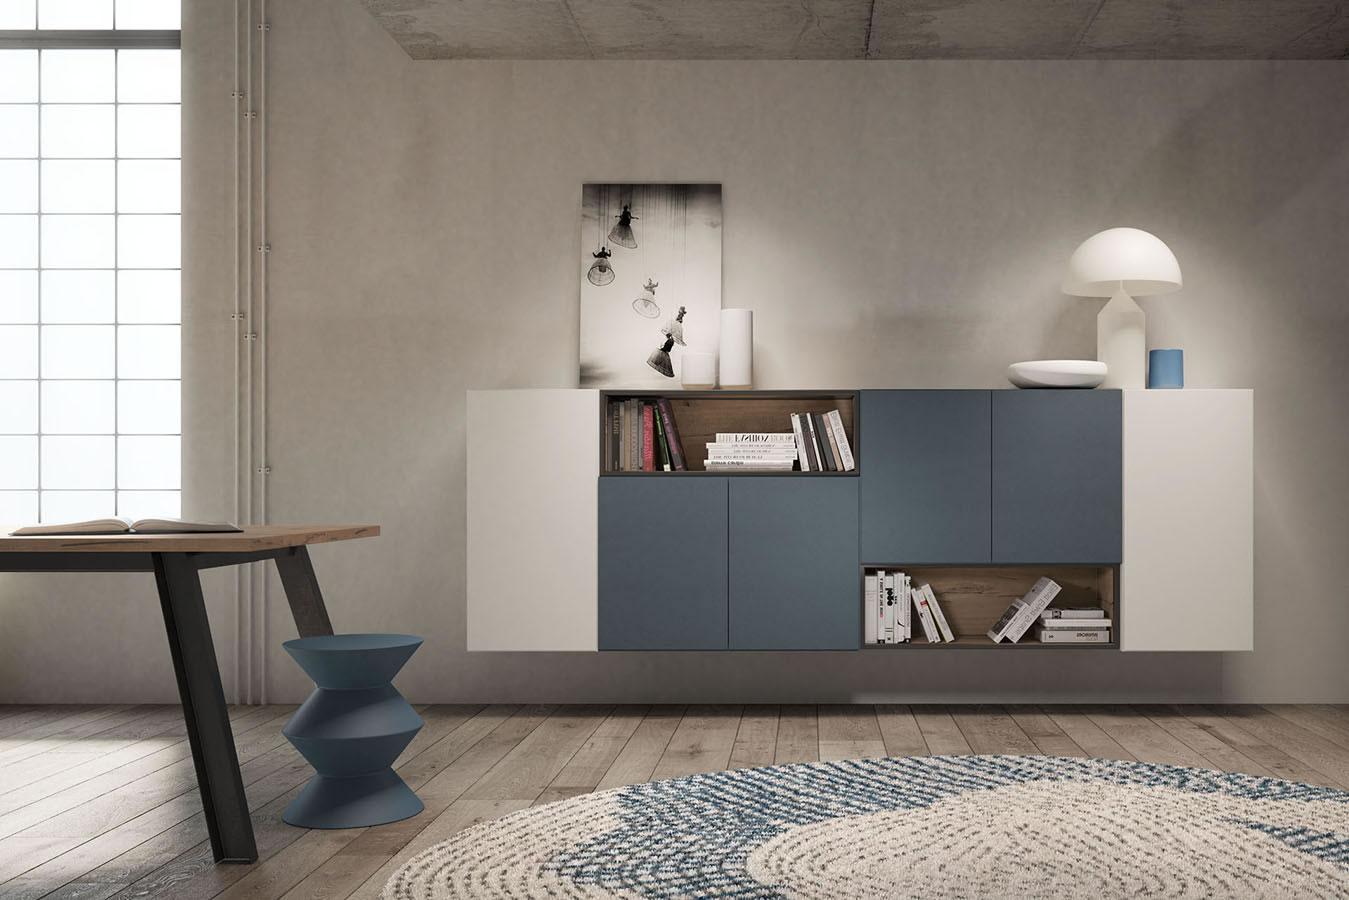 MR 03 Modern Italian Cupboards